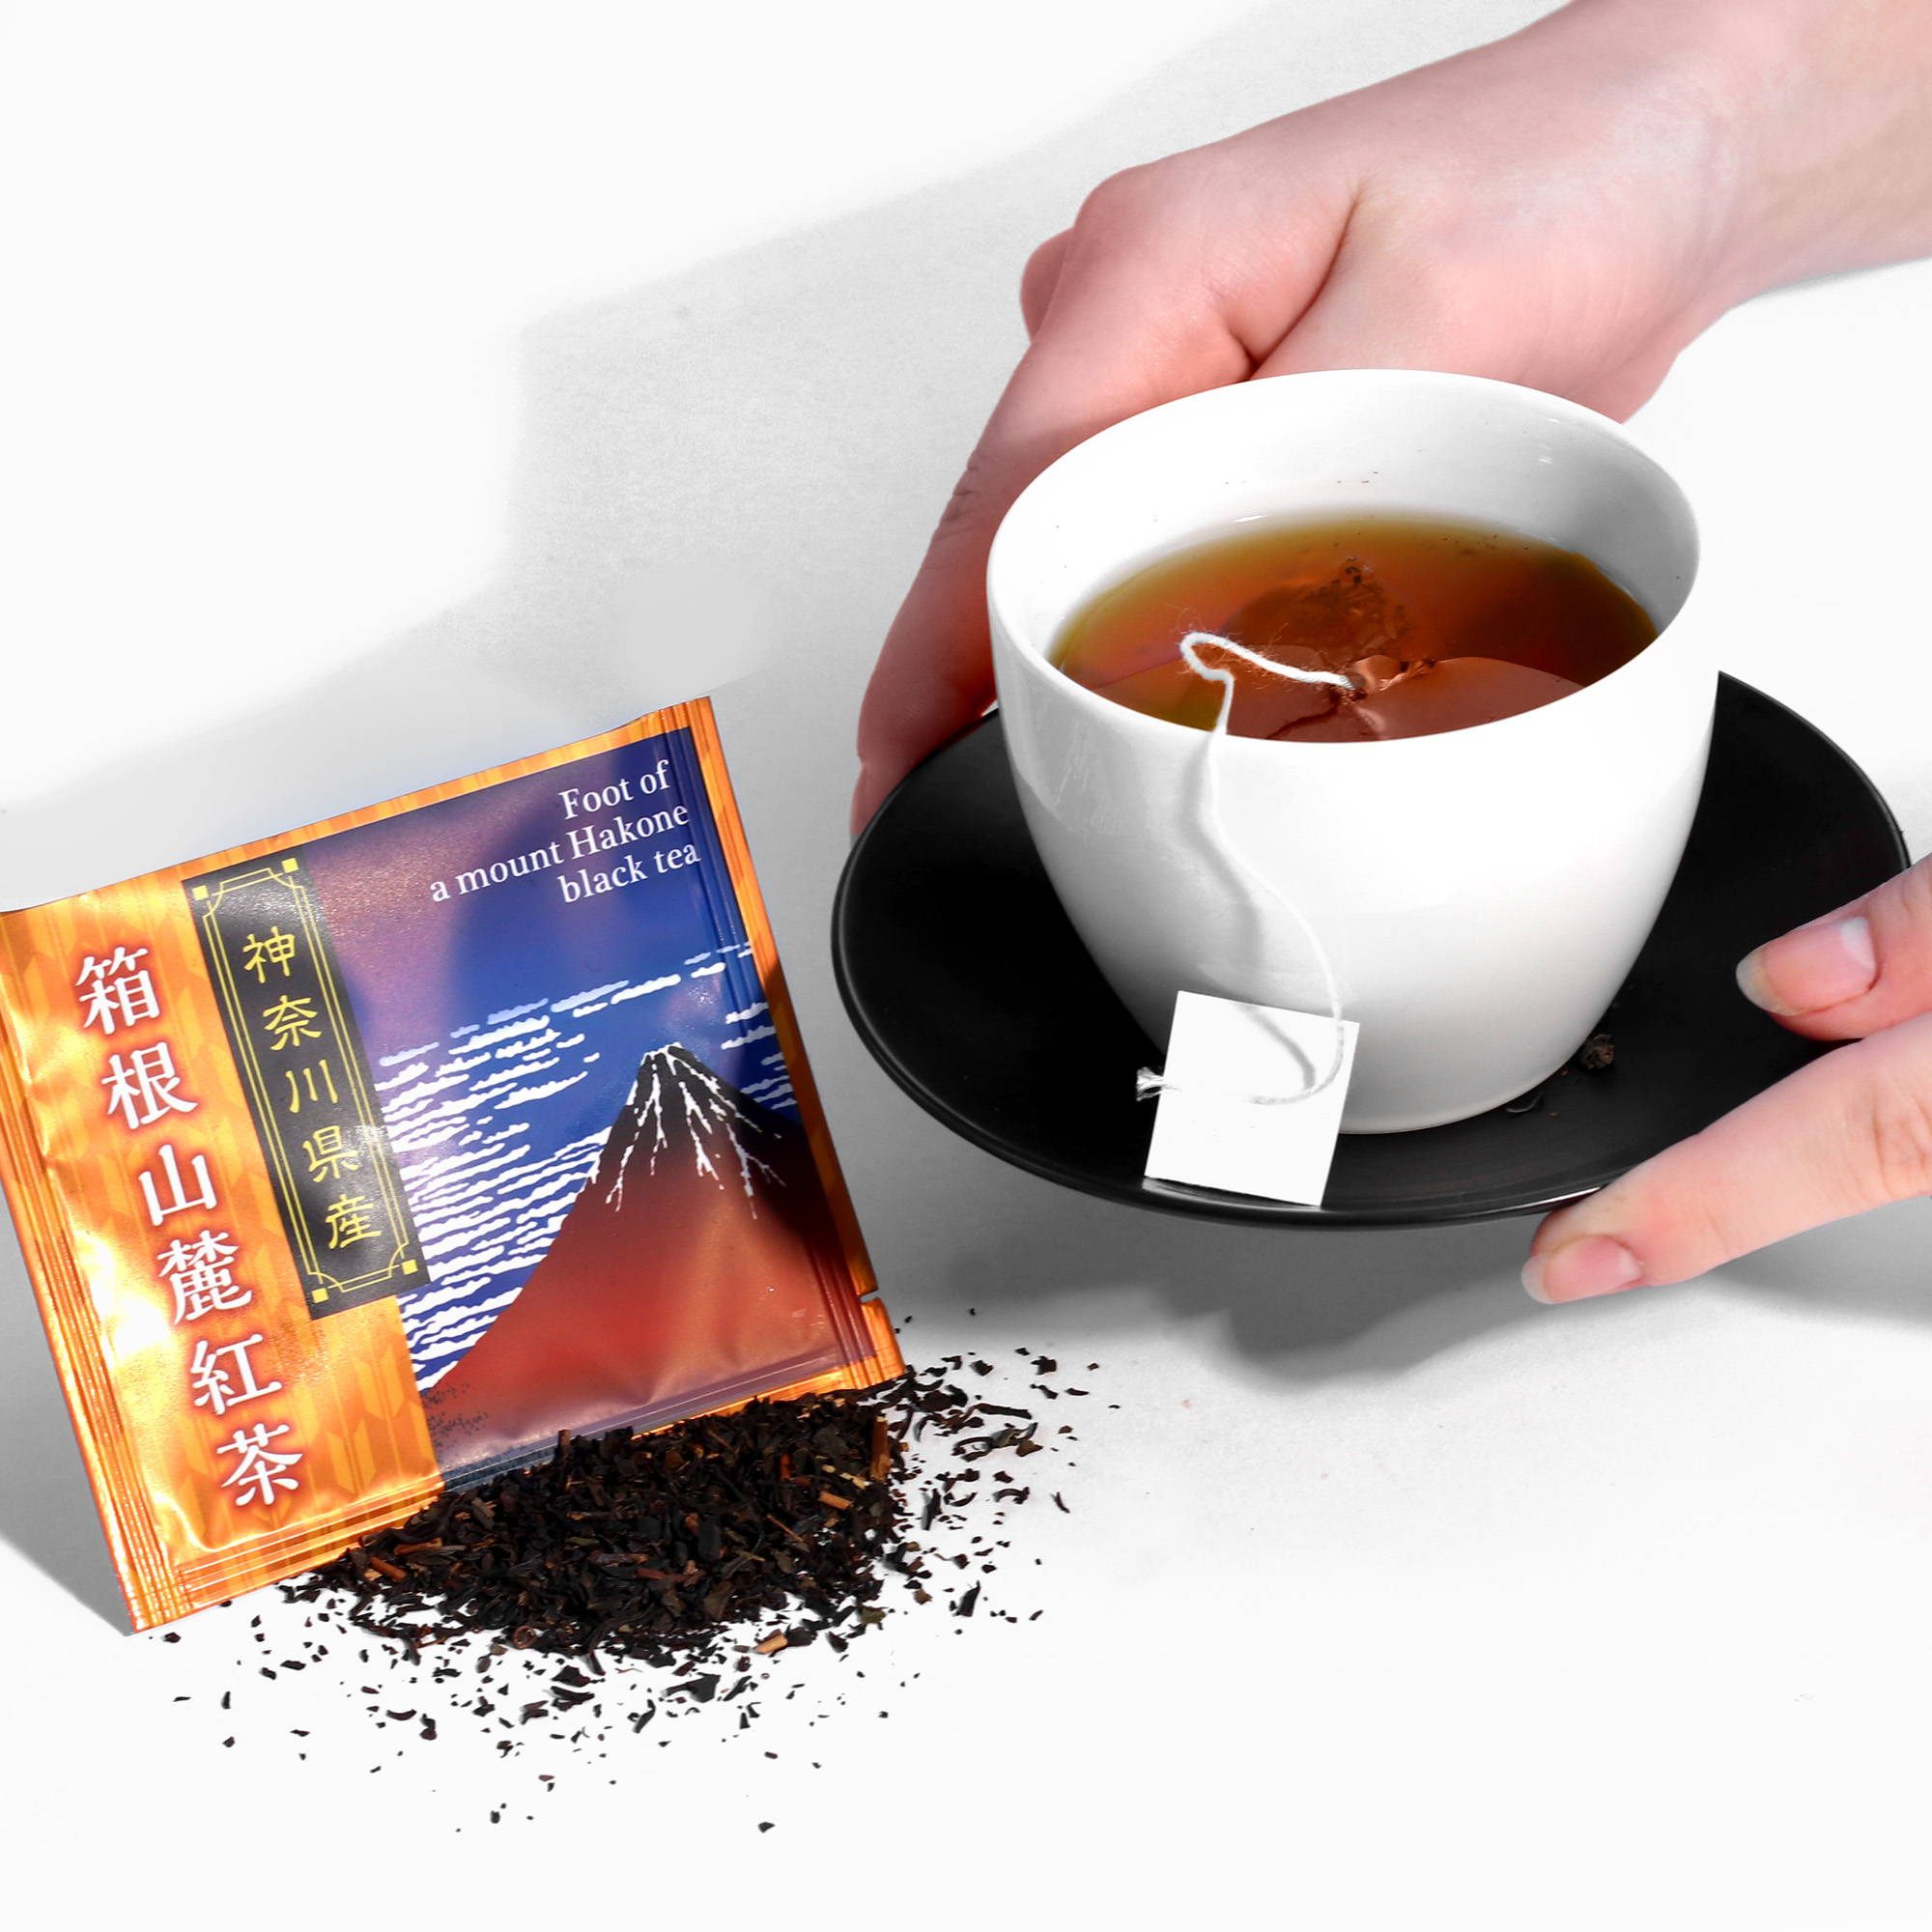 Hakone Sanroku Black Tea Akafuji